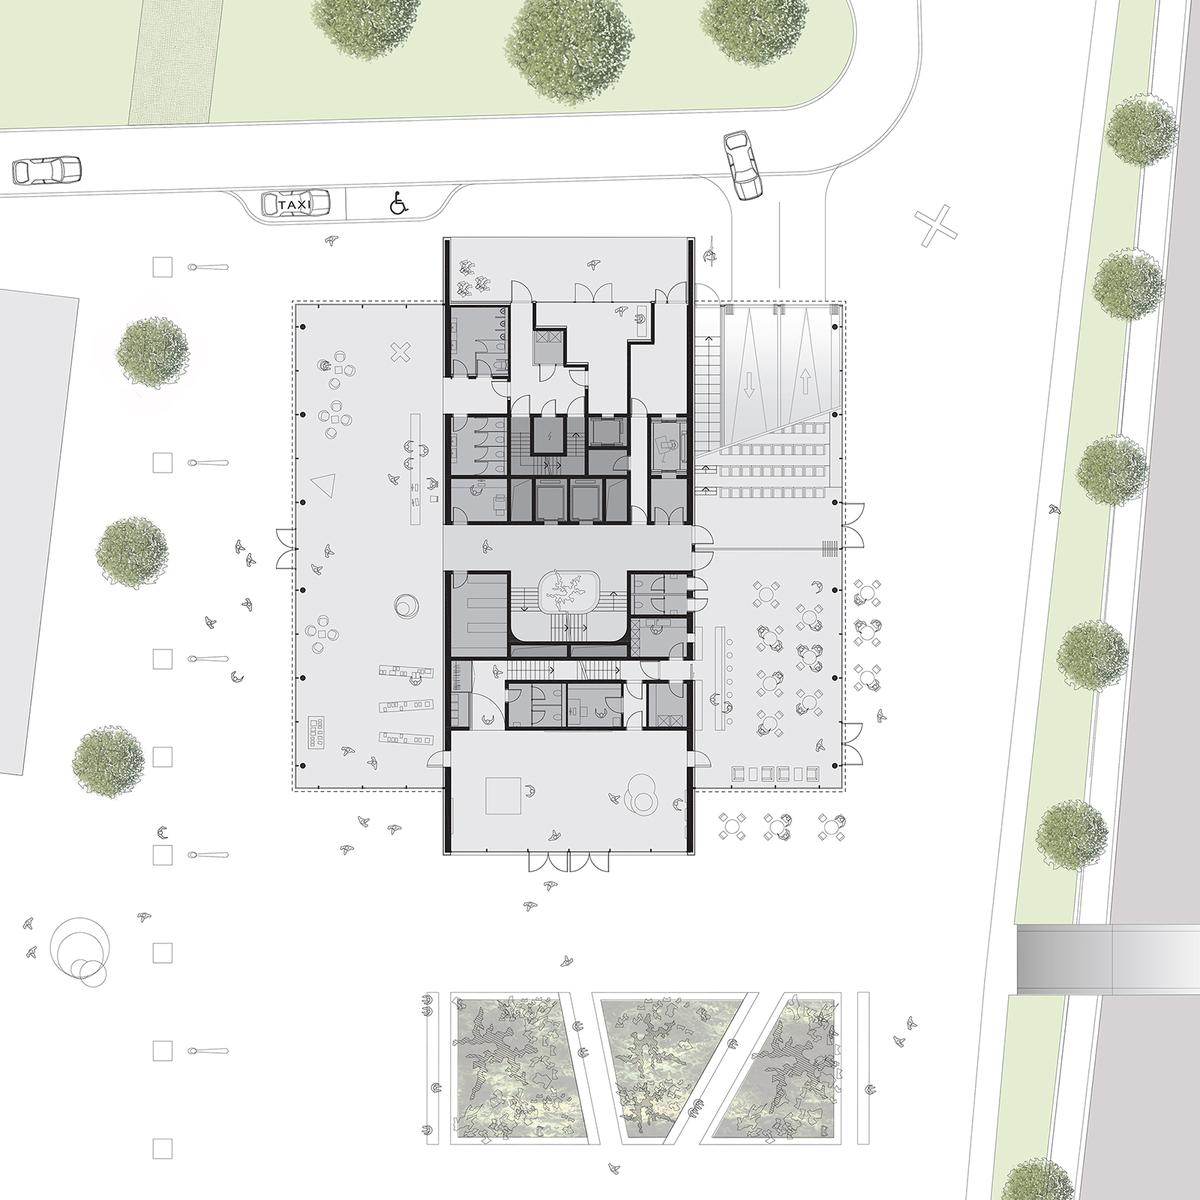 Plan Groundfloor